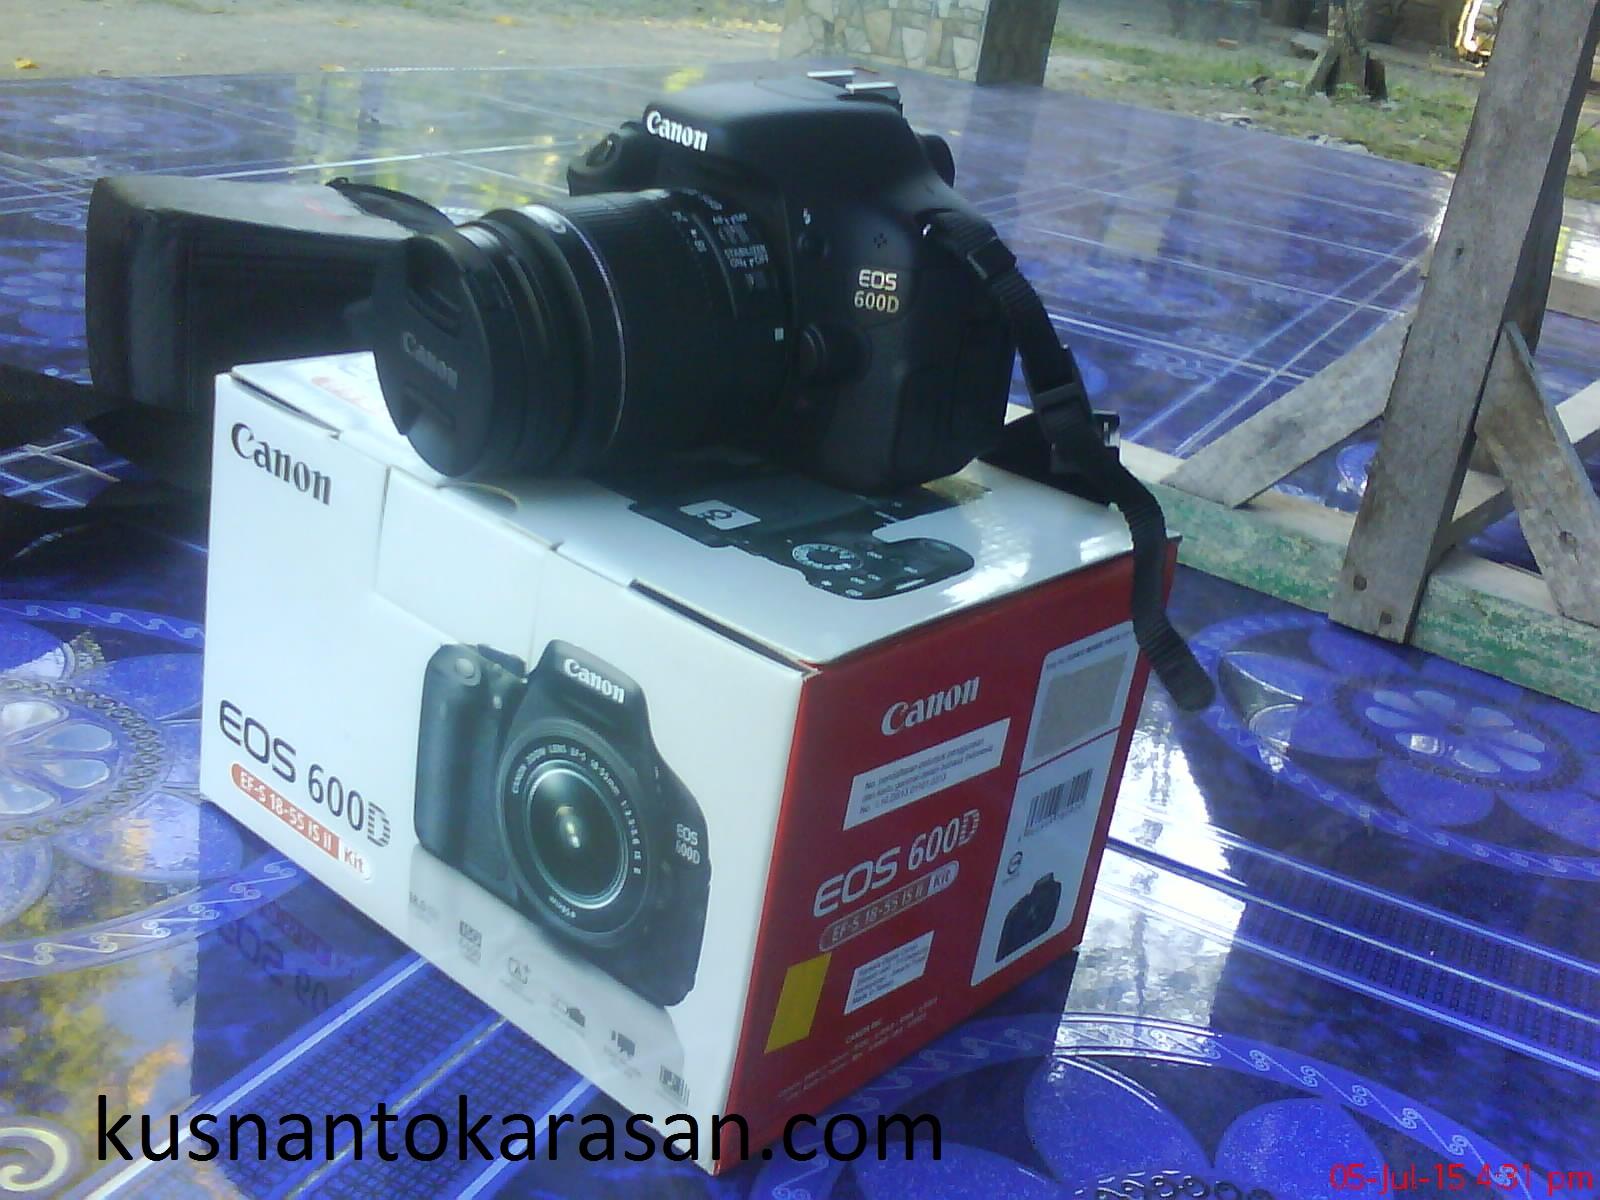 sisi kiri kamera canon EOS 600D